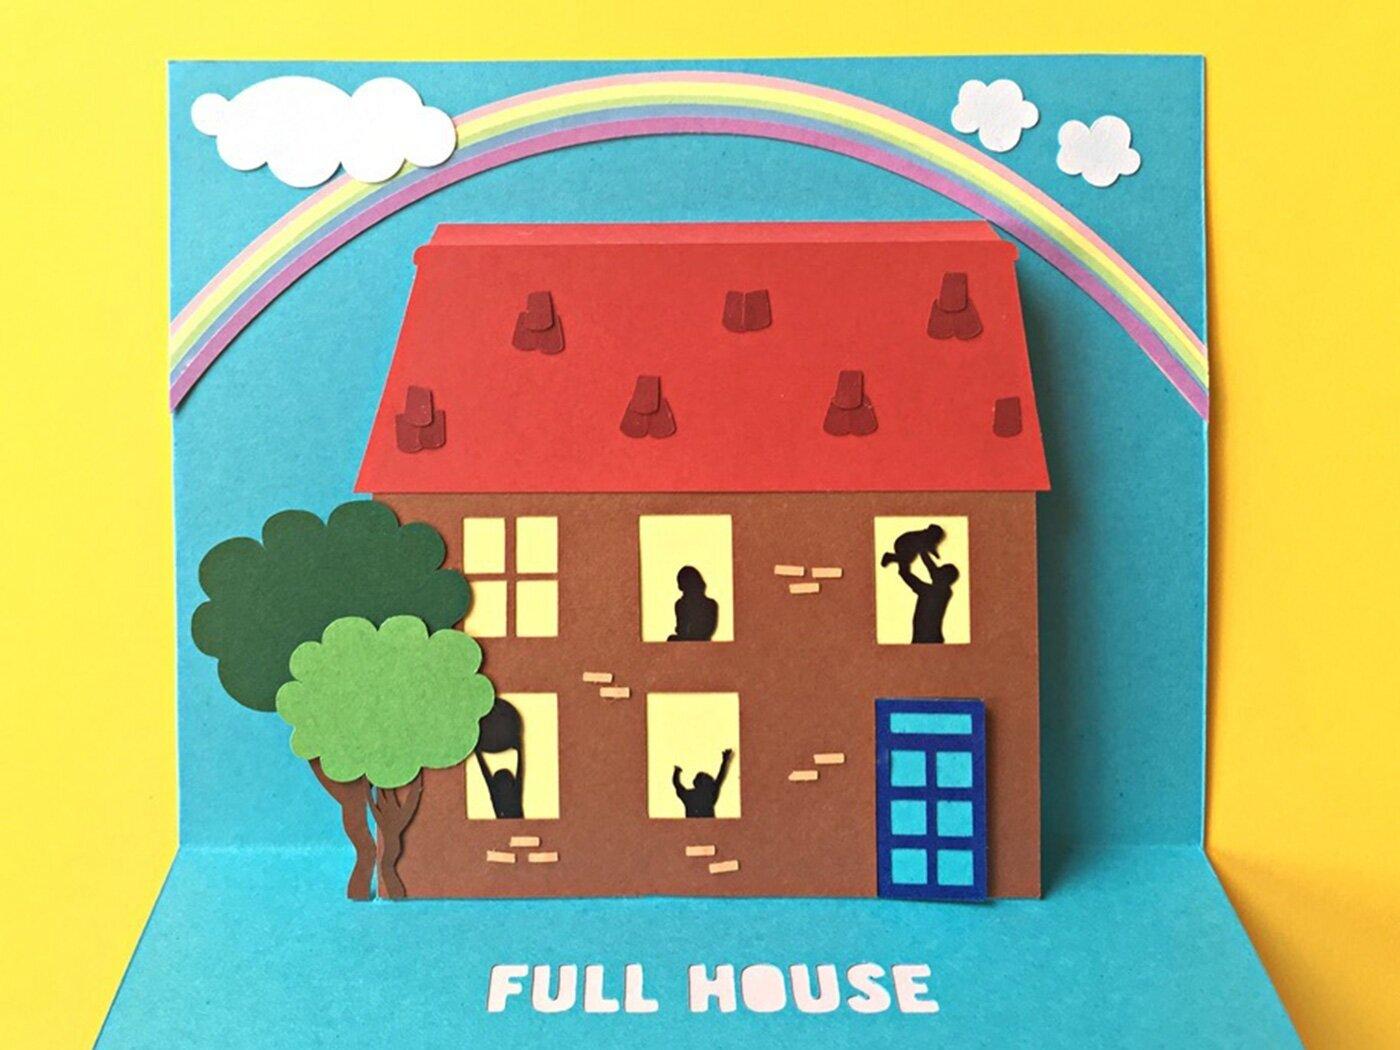 Pop_up_card_full_house_web.jpg